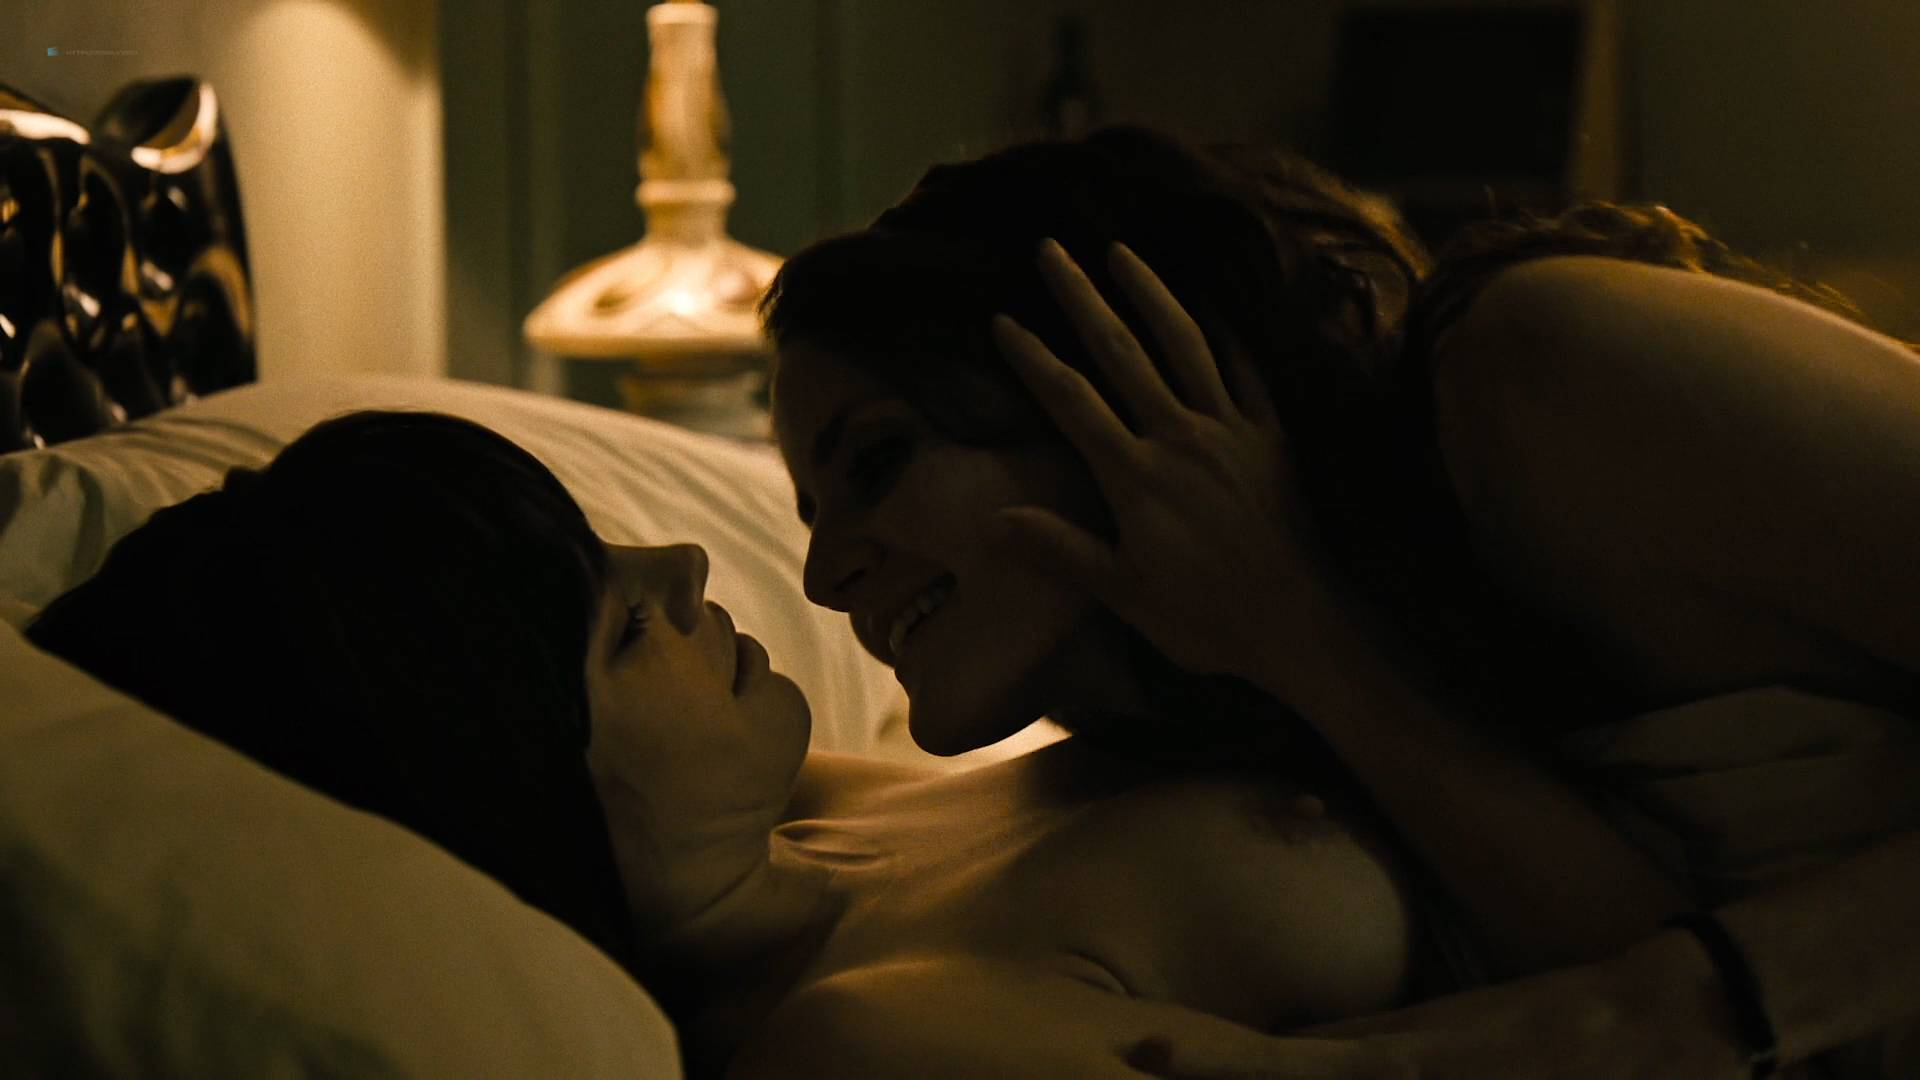 Maggie Gyllenhaal nude oral Margarita Levieva nude sex Kayla Foster lesbian - The Deuce (2017) s1e4 HD1080p (14)